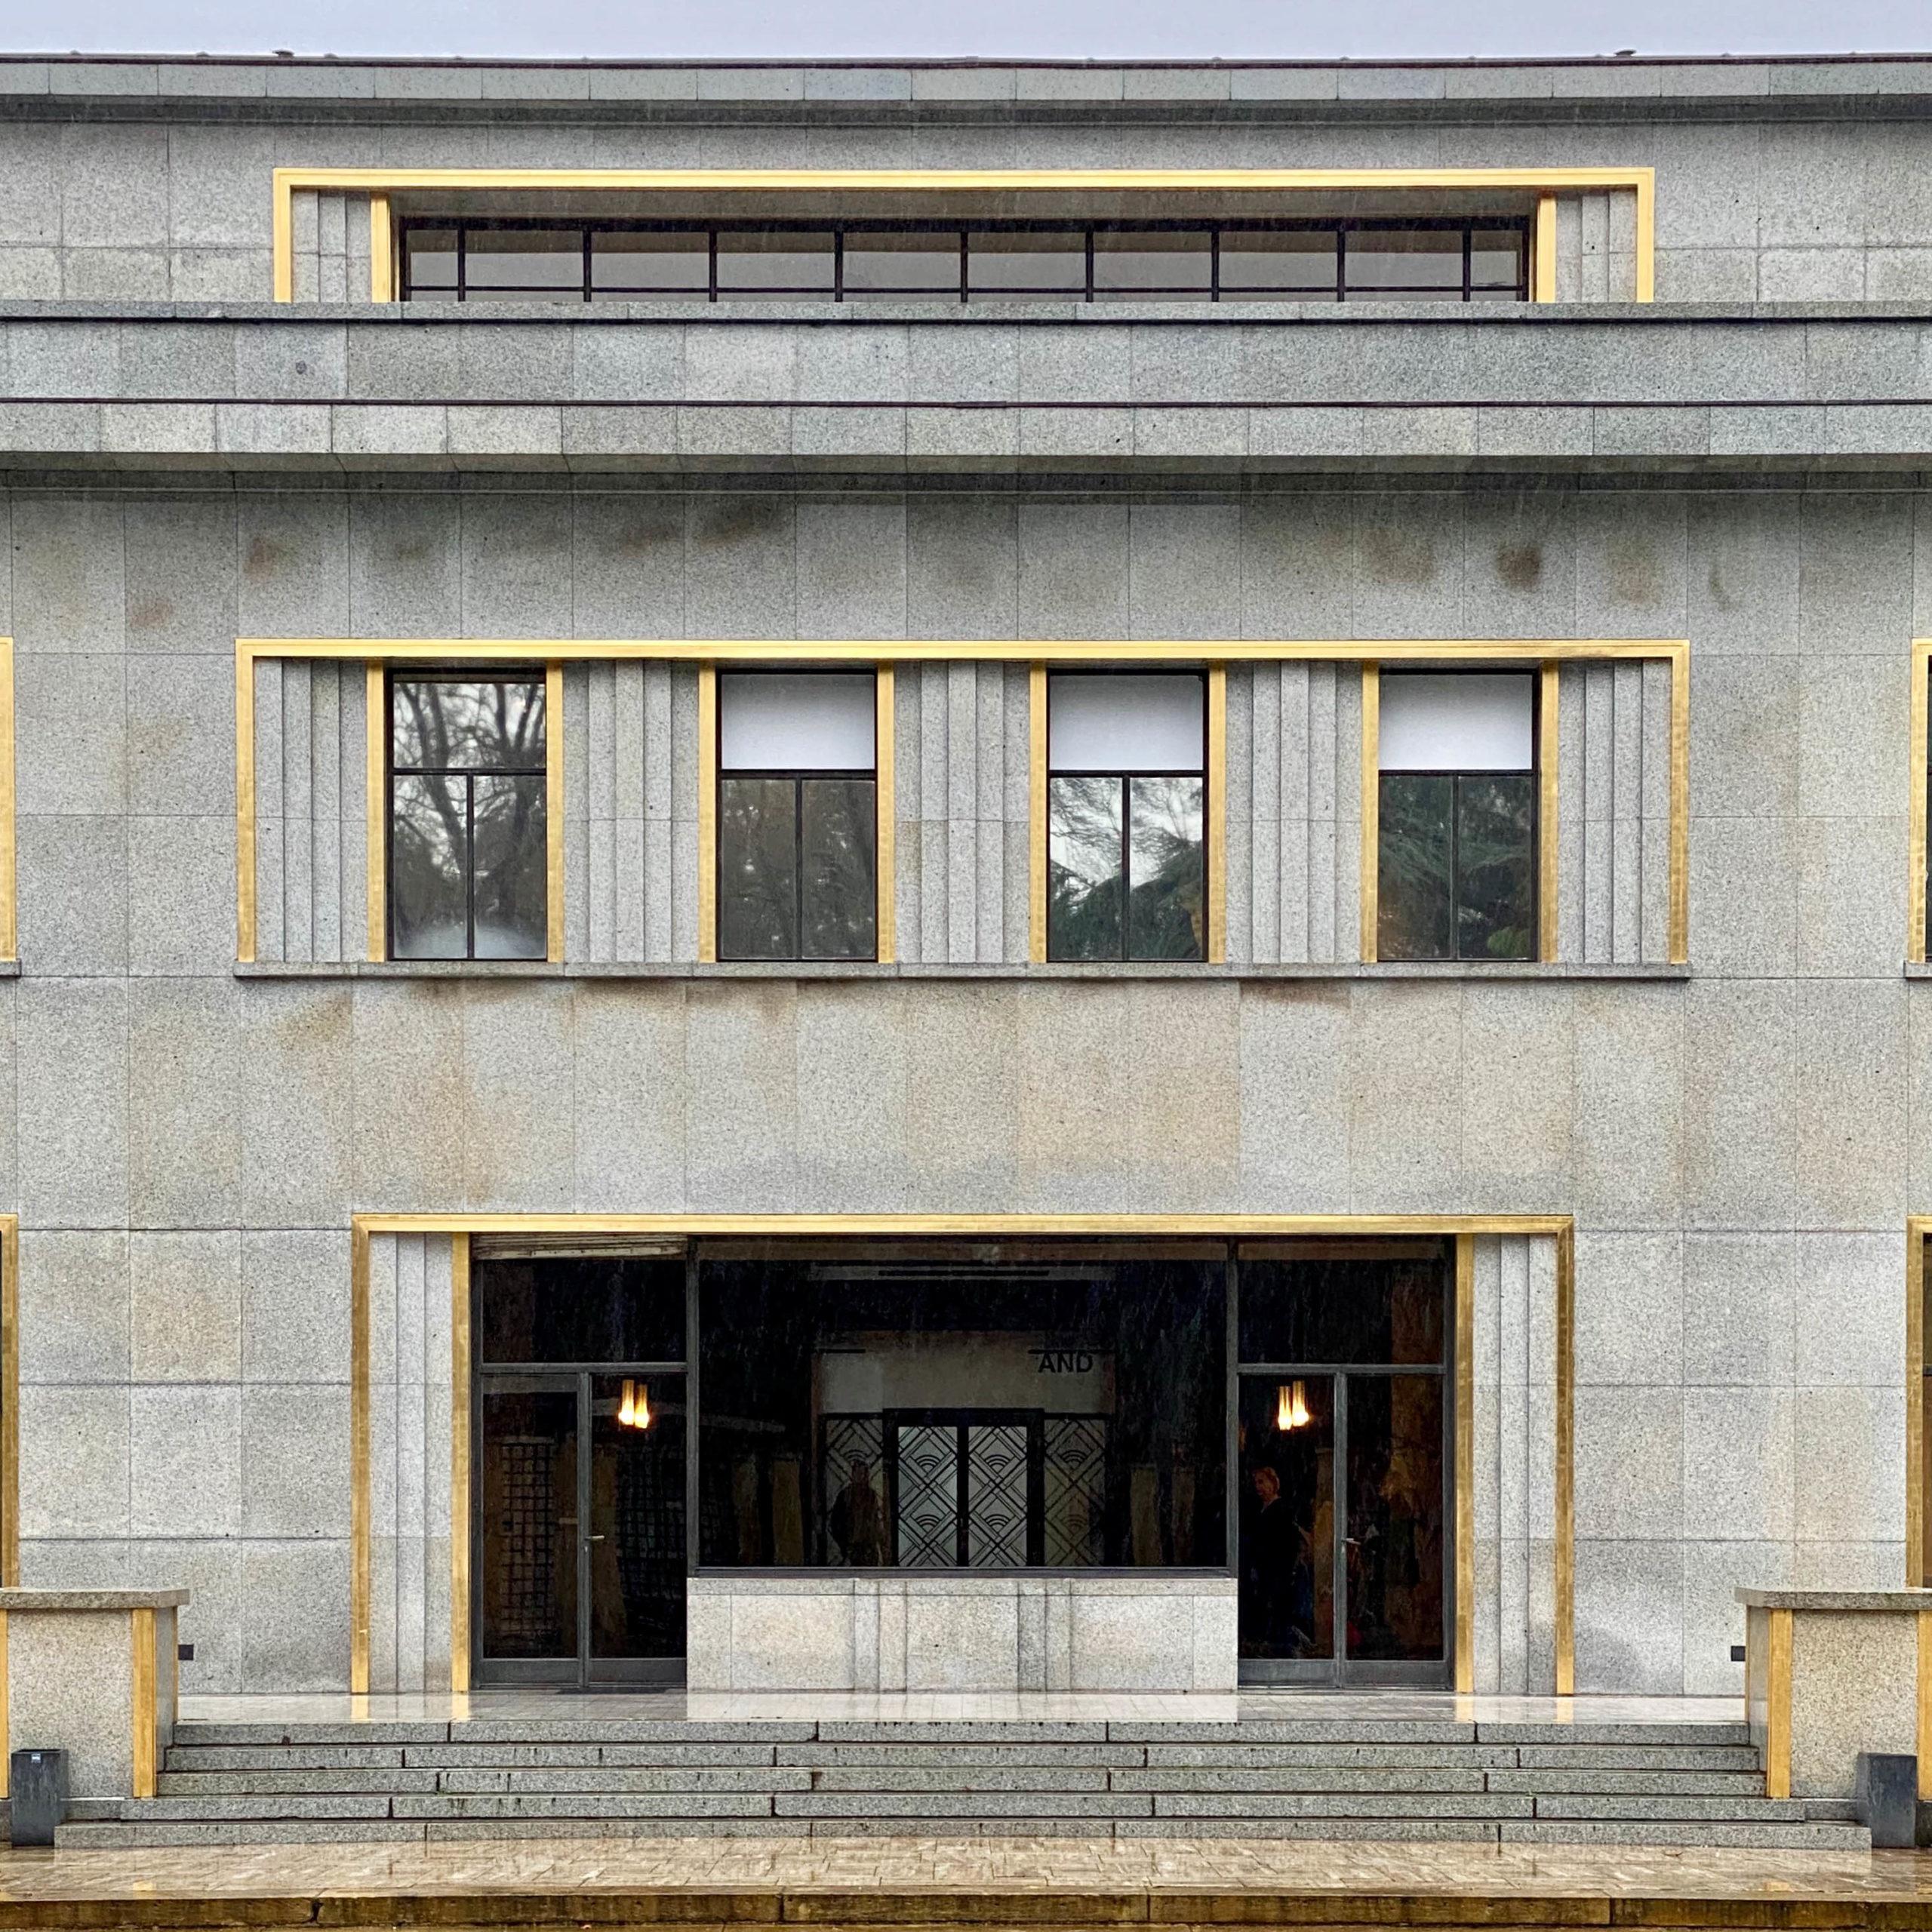 Villa Empain, 1930-1935. Architect: Michel Polak